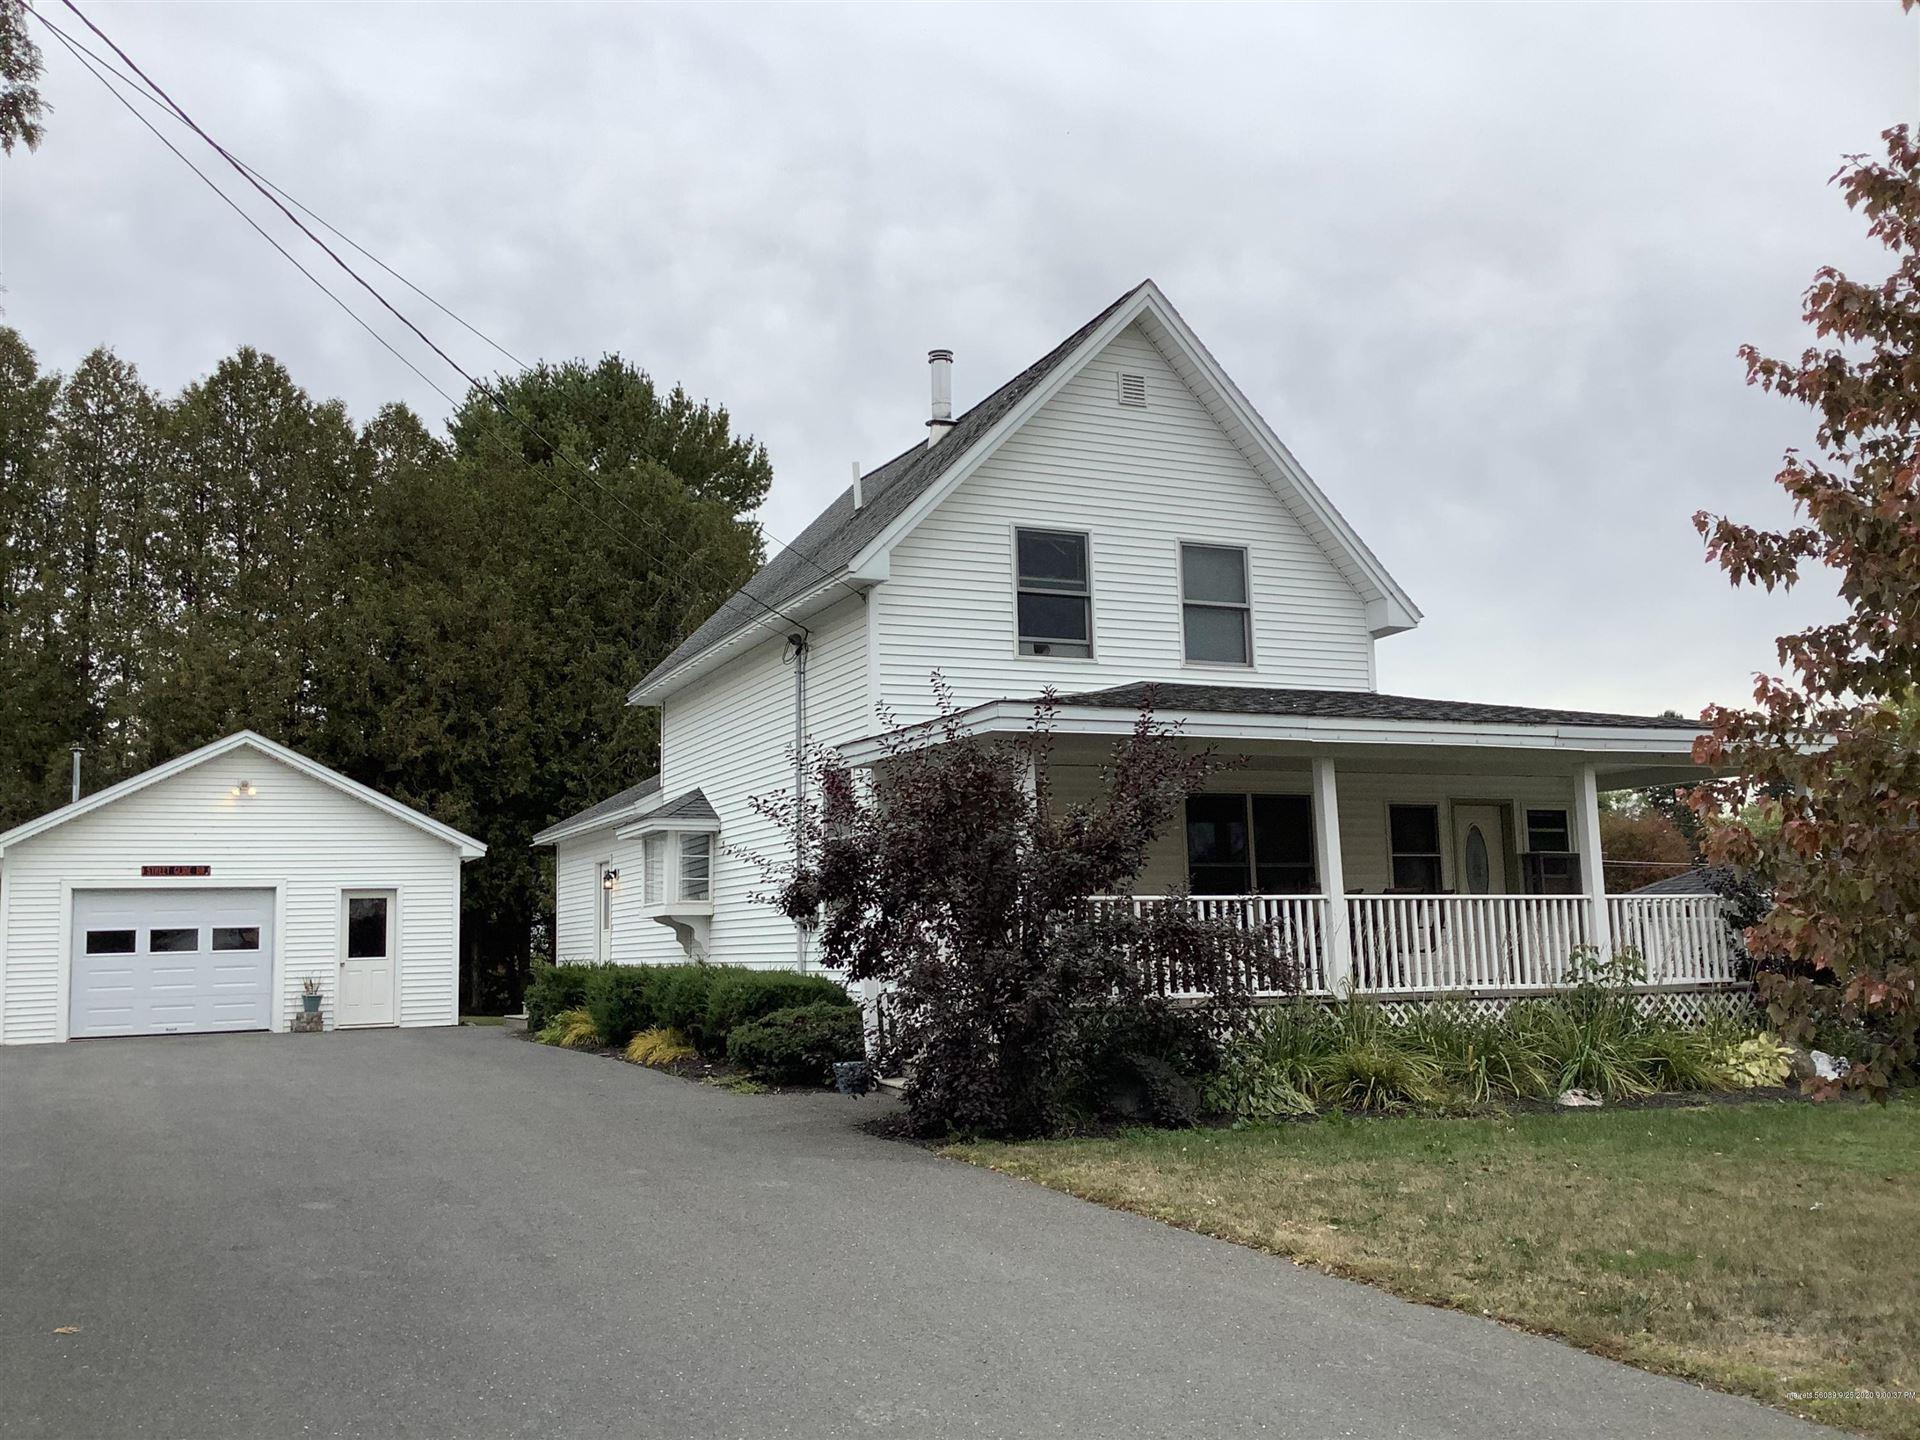 Photo of 6 Center Street, Fort Fairfield, ME 04742 (MLS # 1470116)